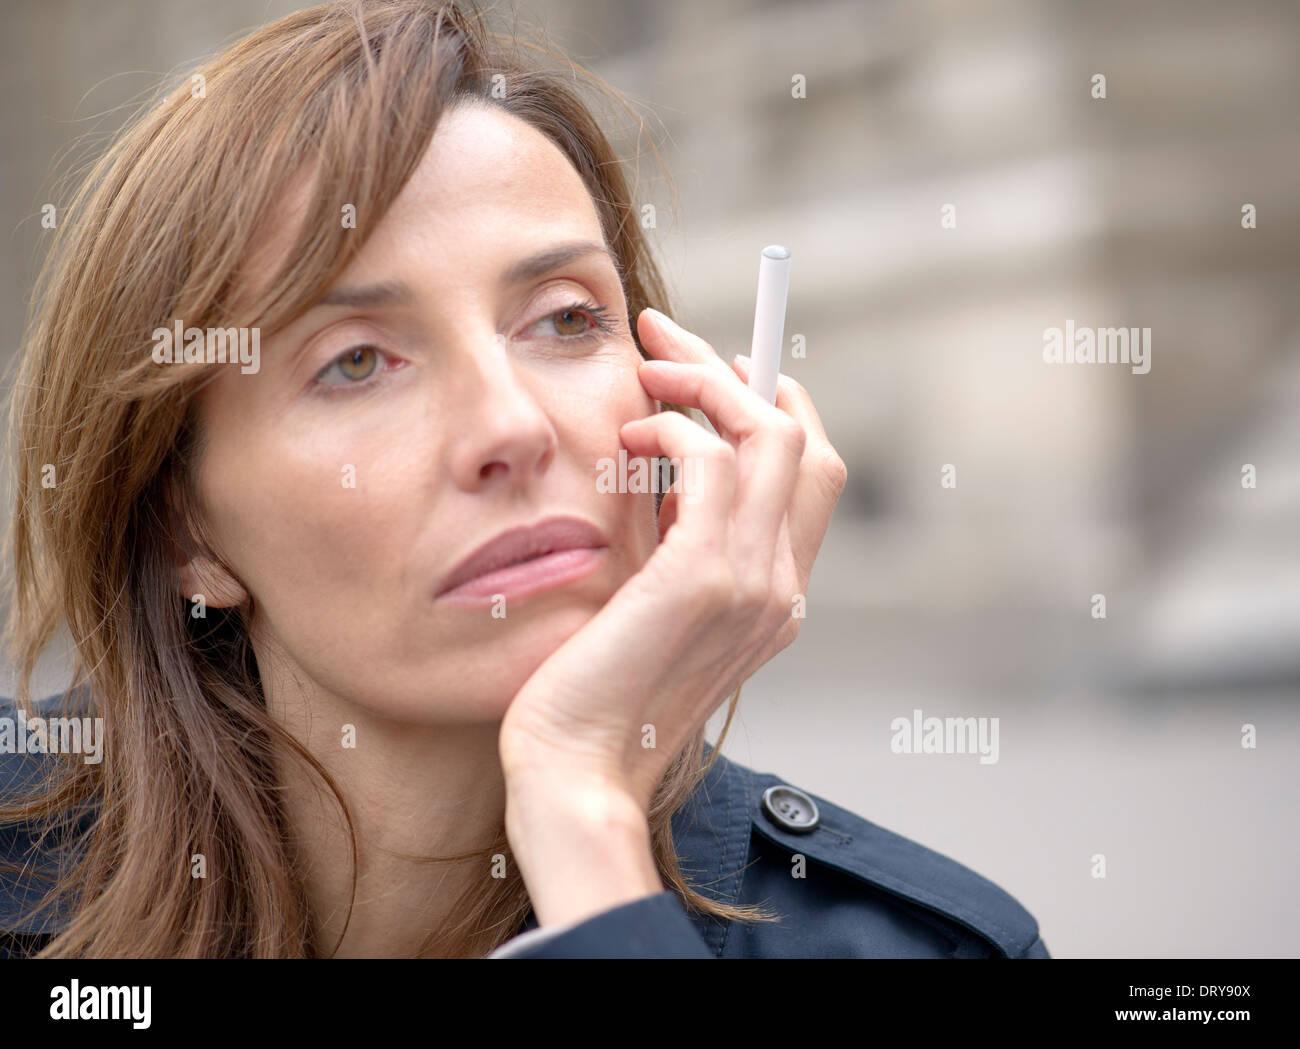 Woman smoking electronic cigarette outdoors - Stock Image